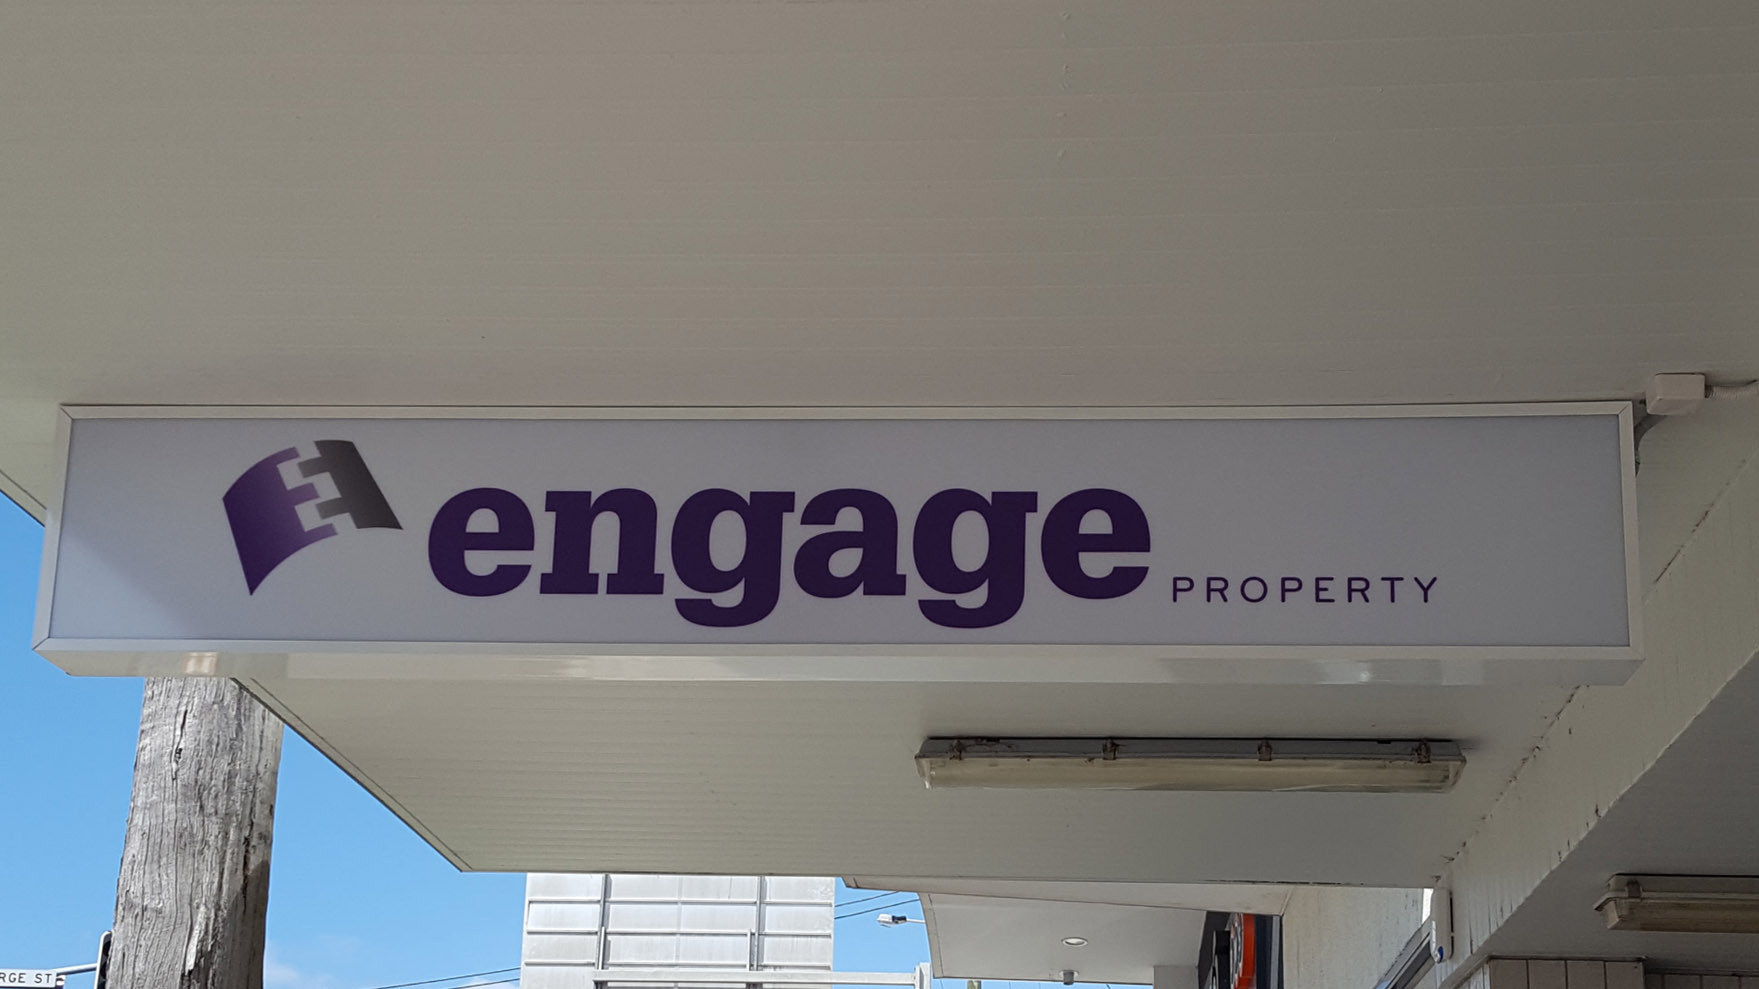 led lightbox real estate sign